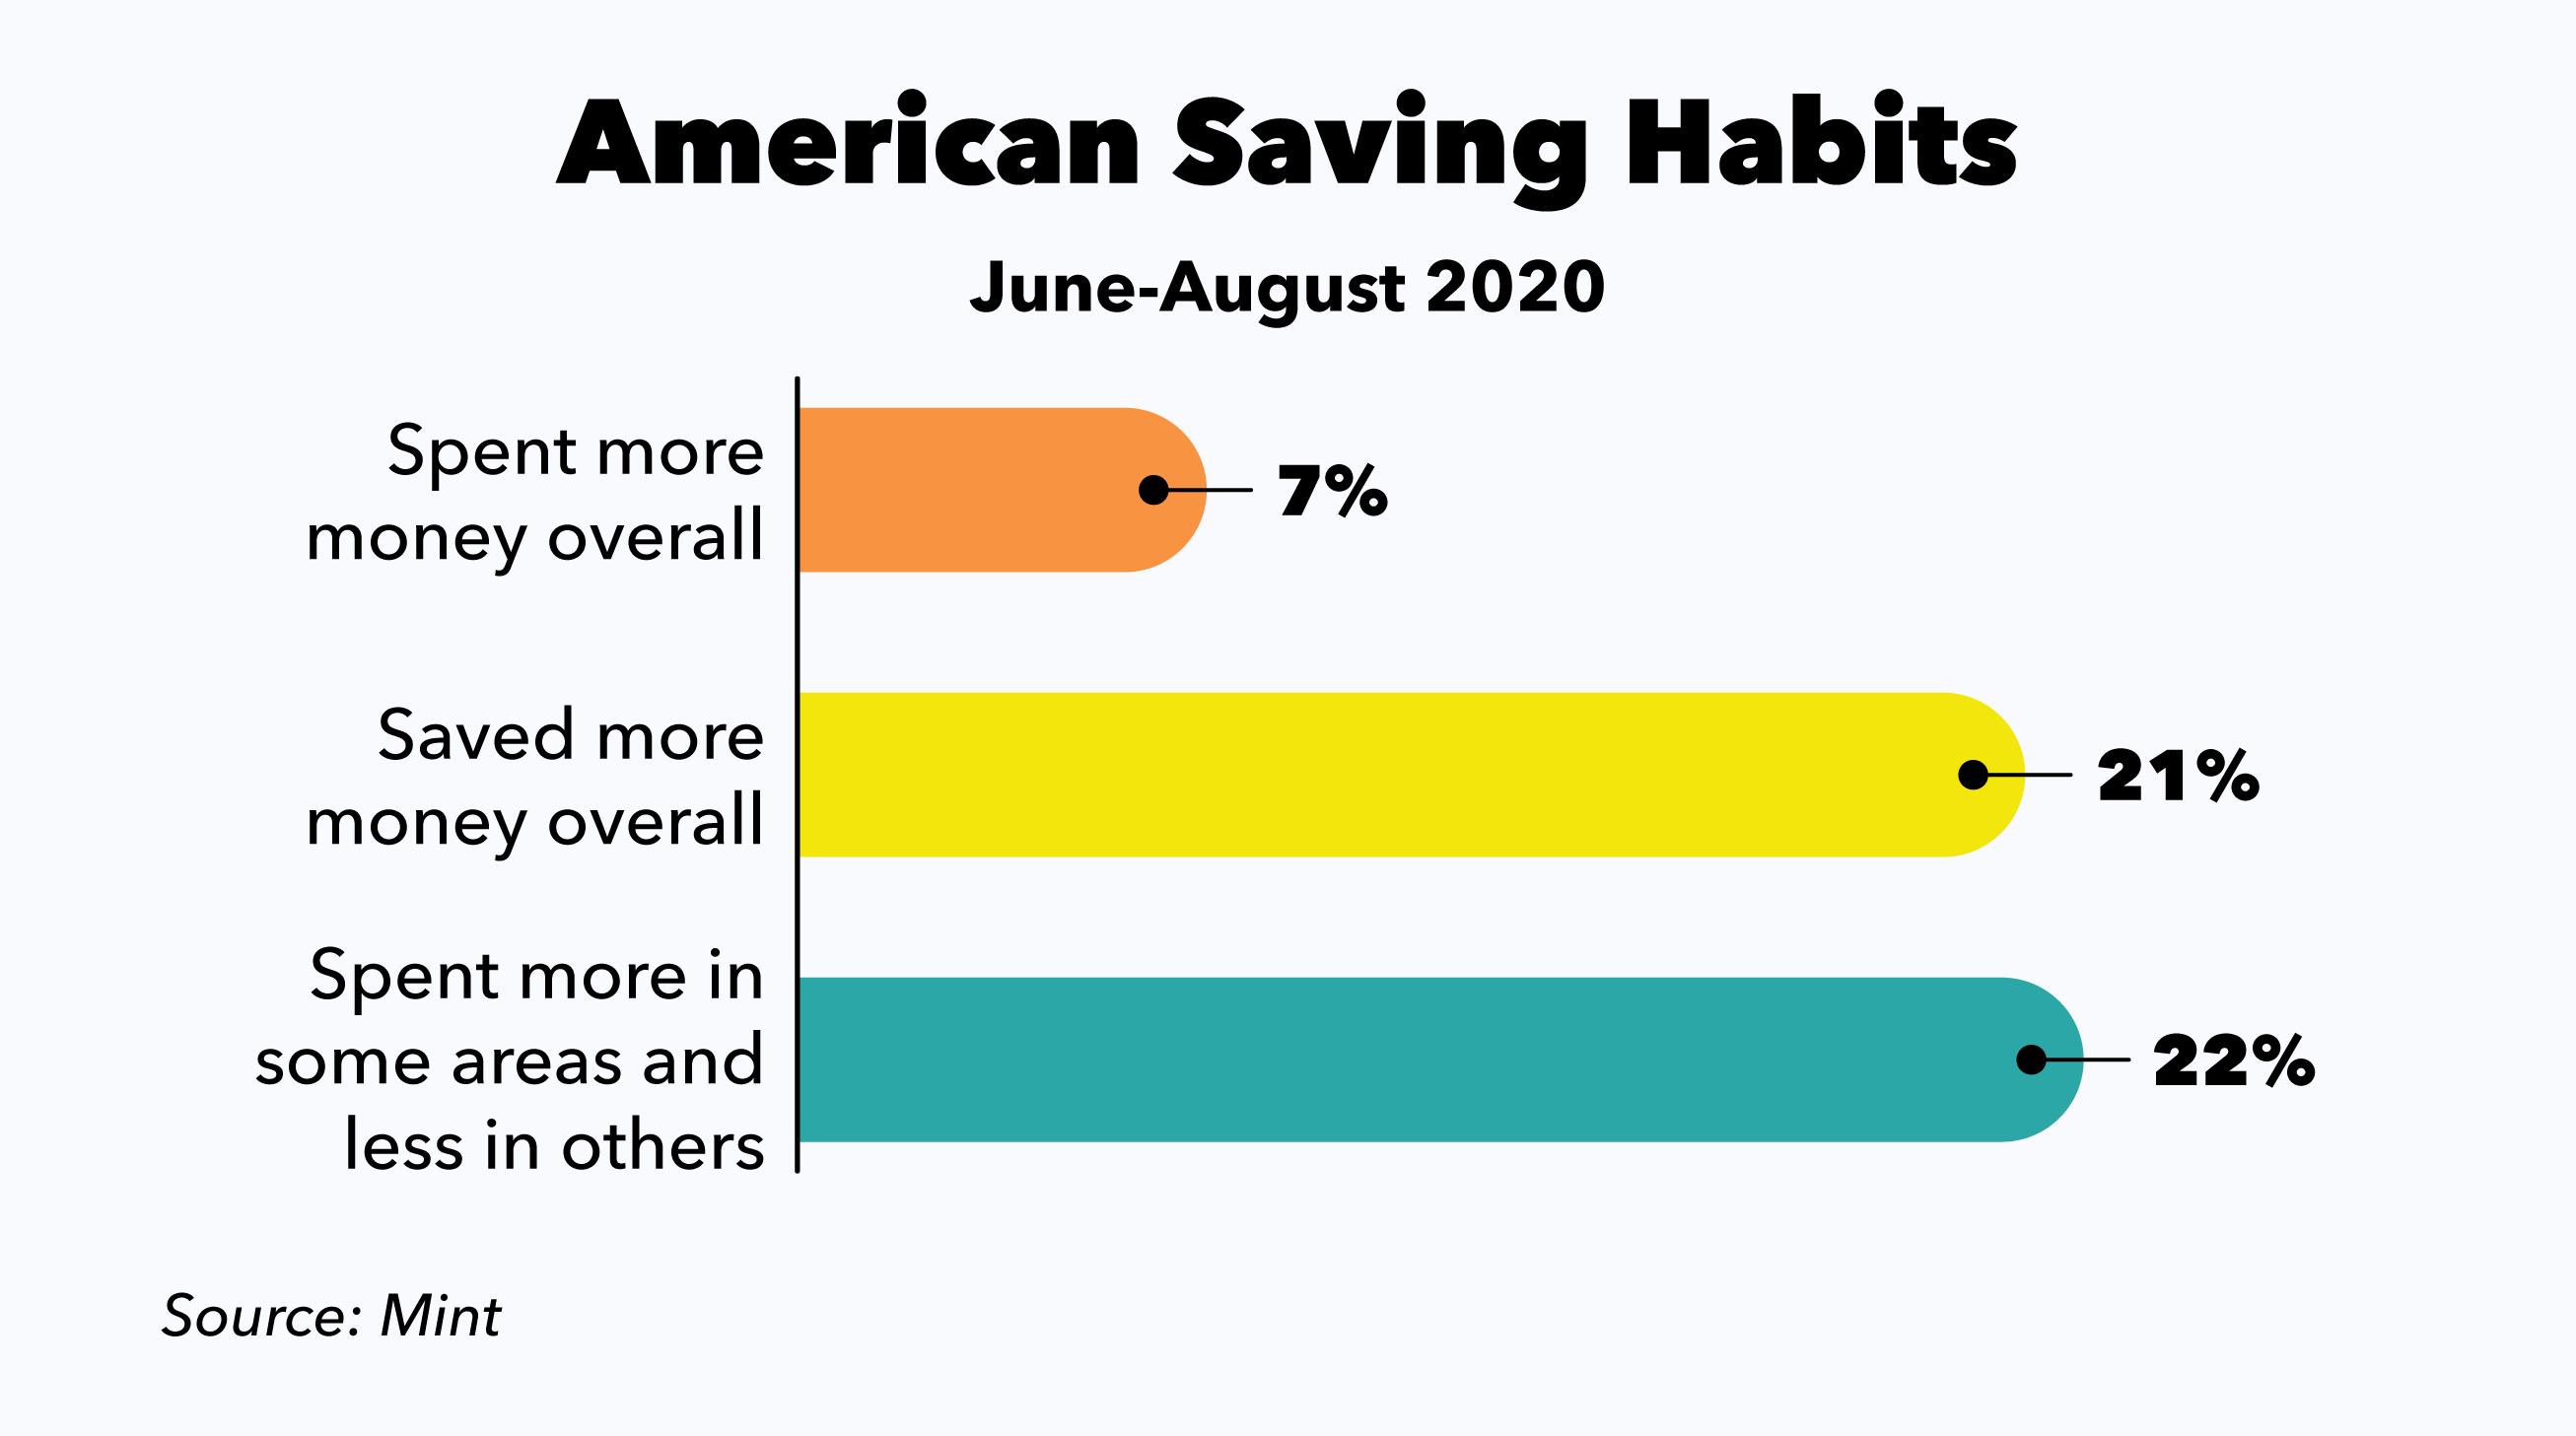 American Saving Habits Bar Chart